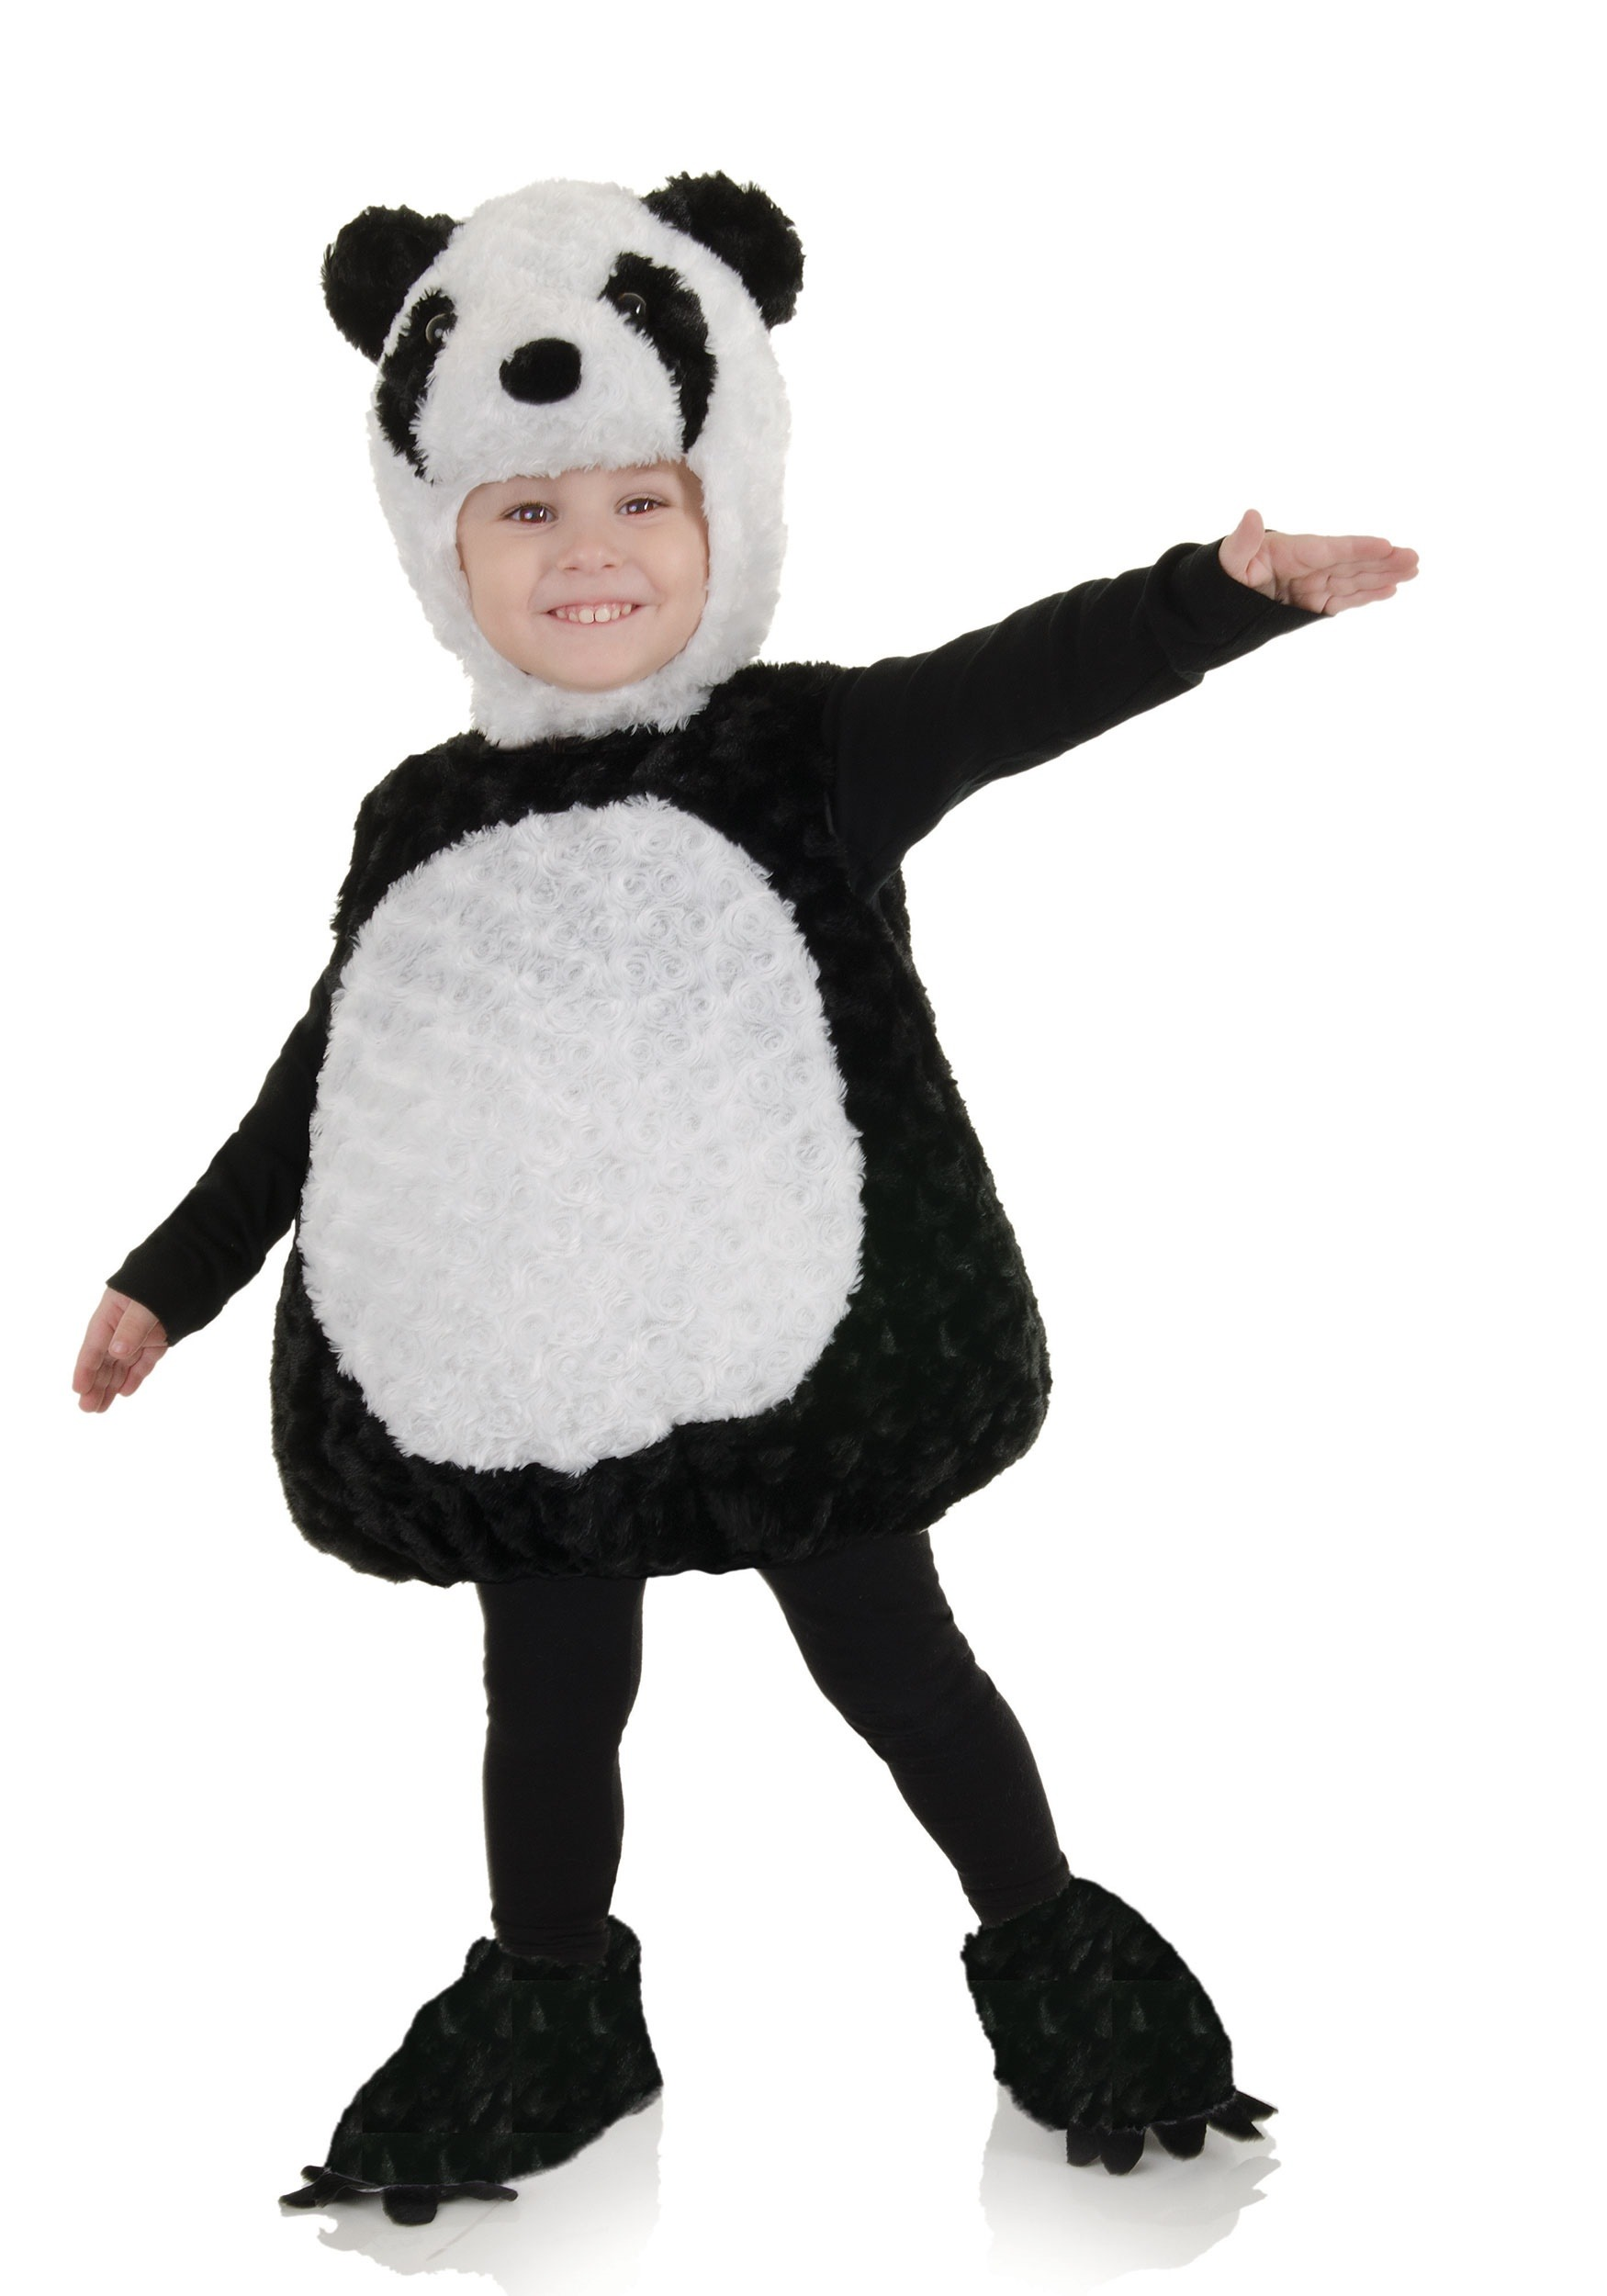 Panda Costume for Toddlers